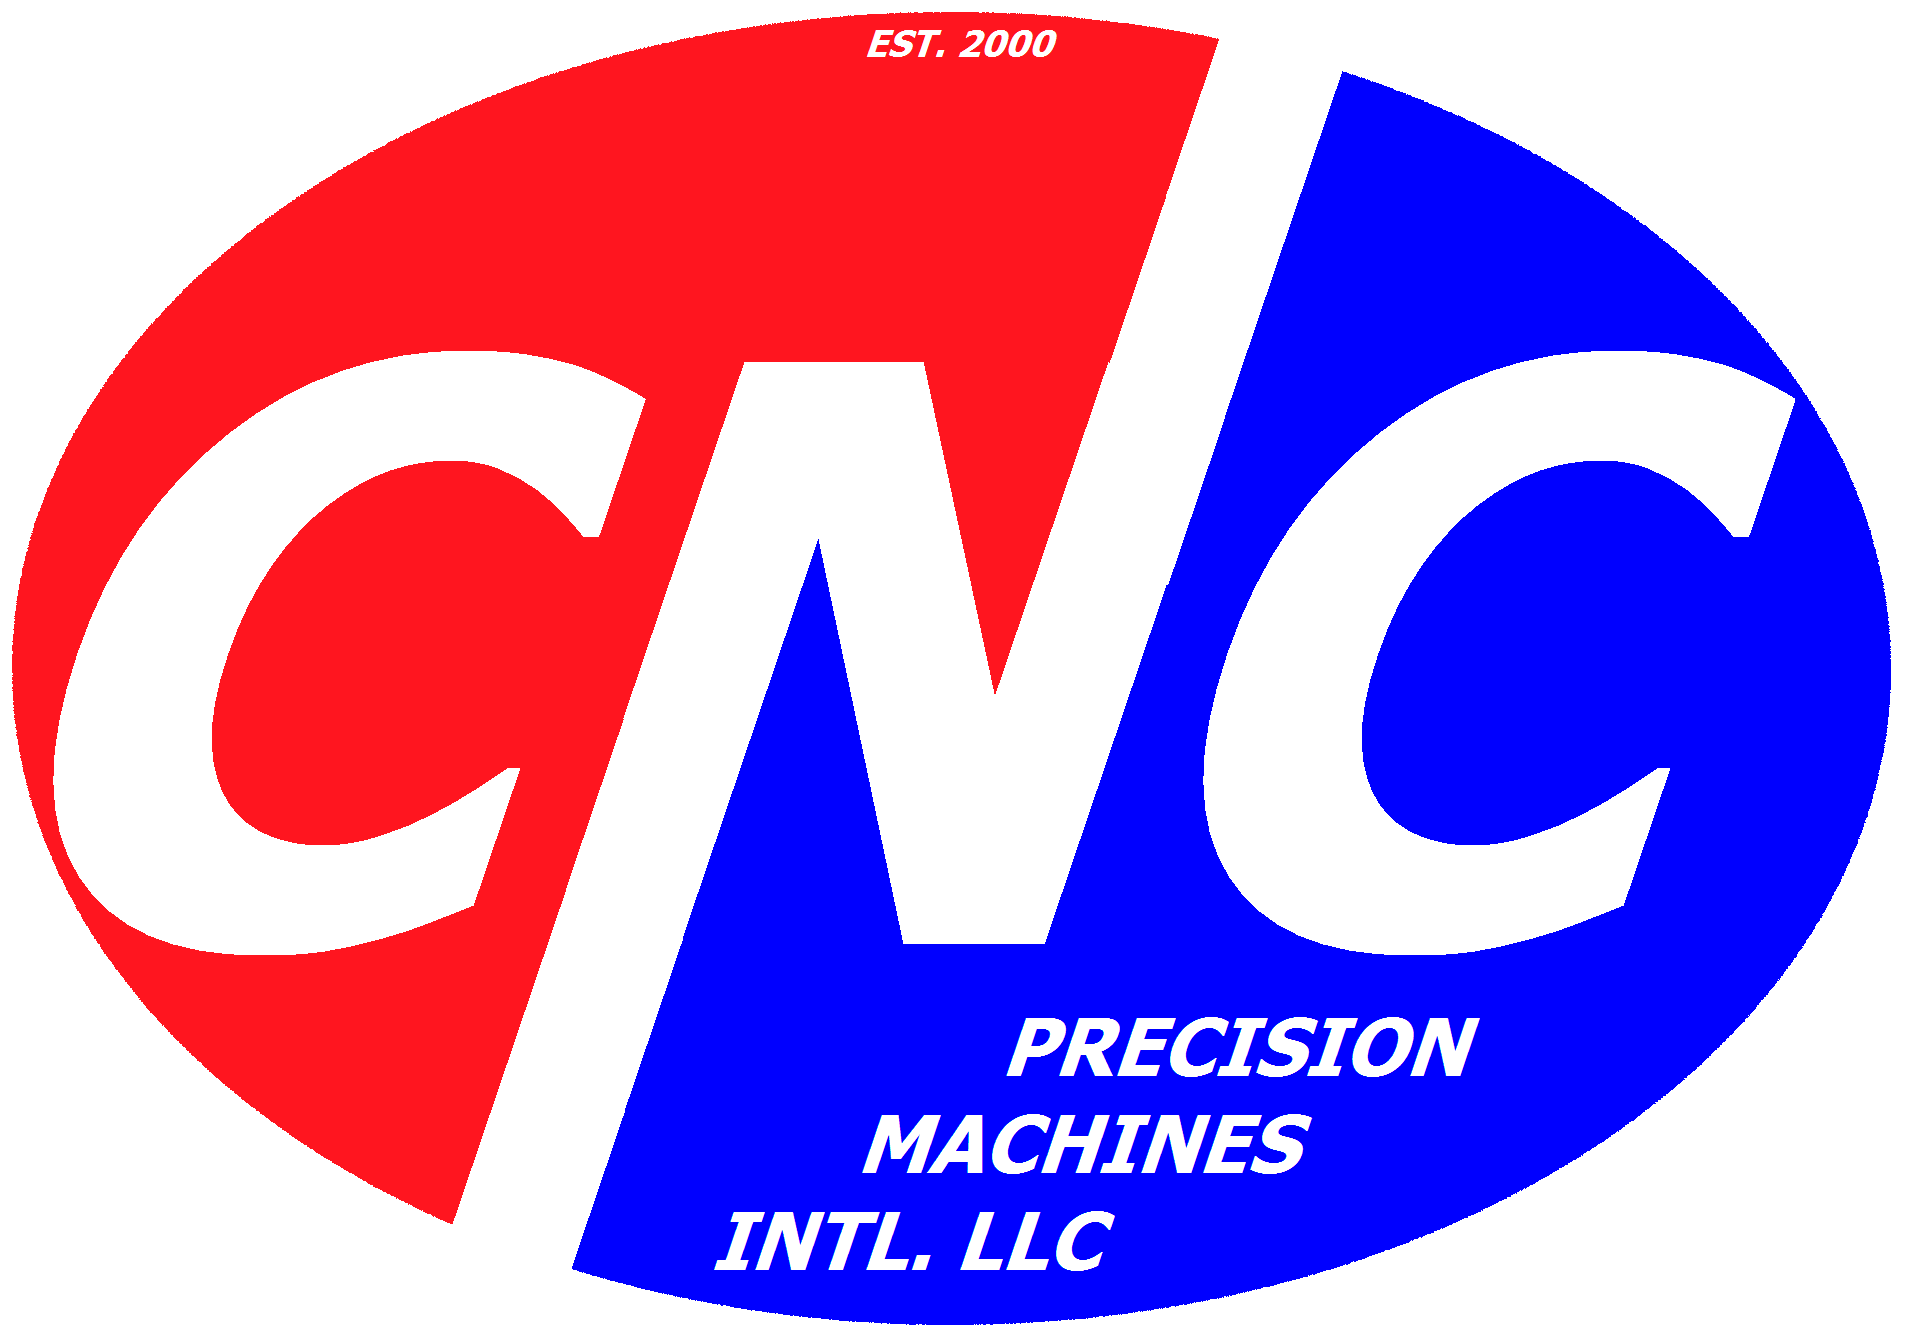 CNC Precision Machines Int. LLC